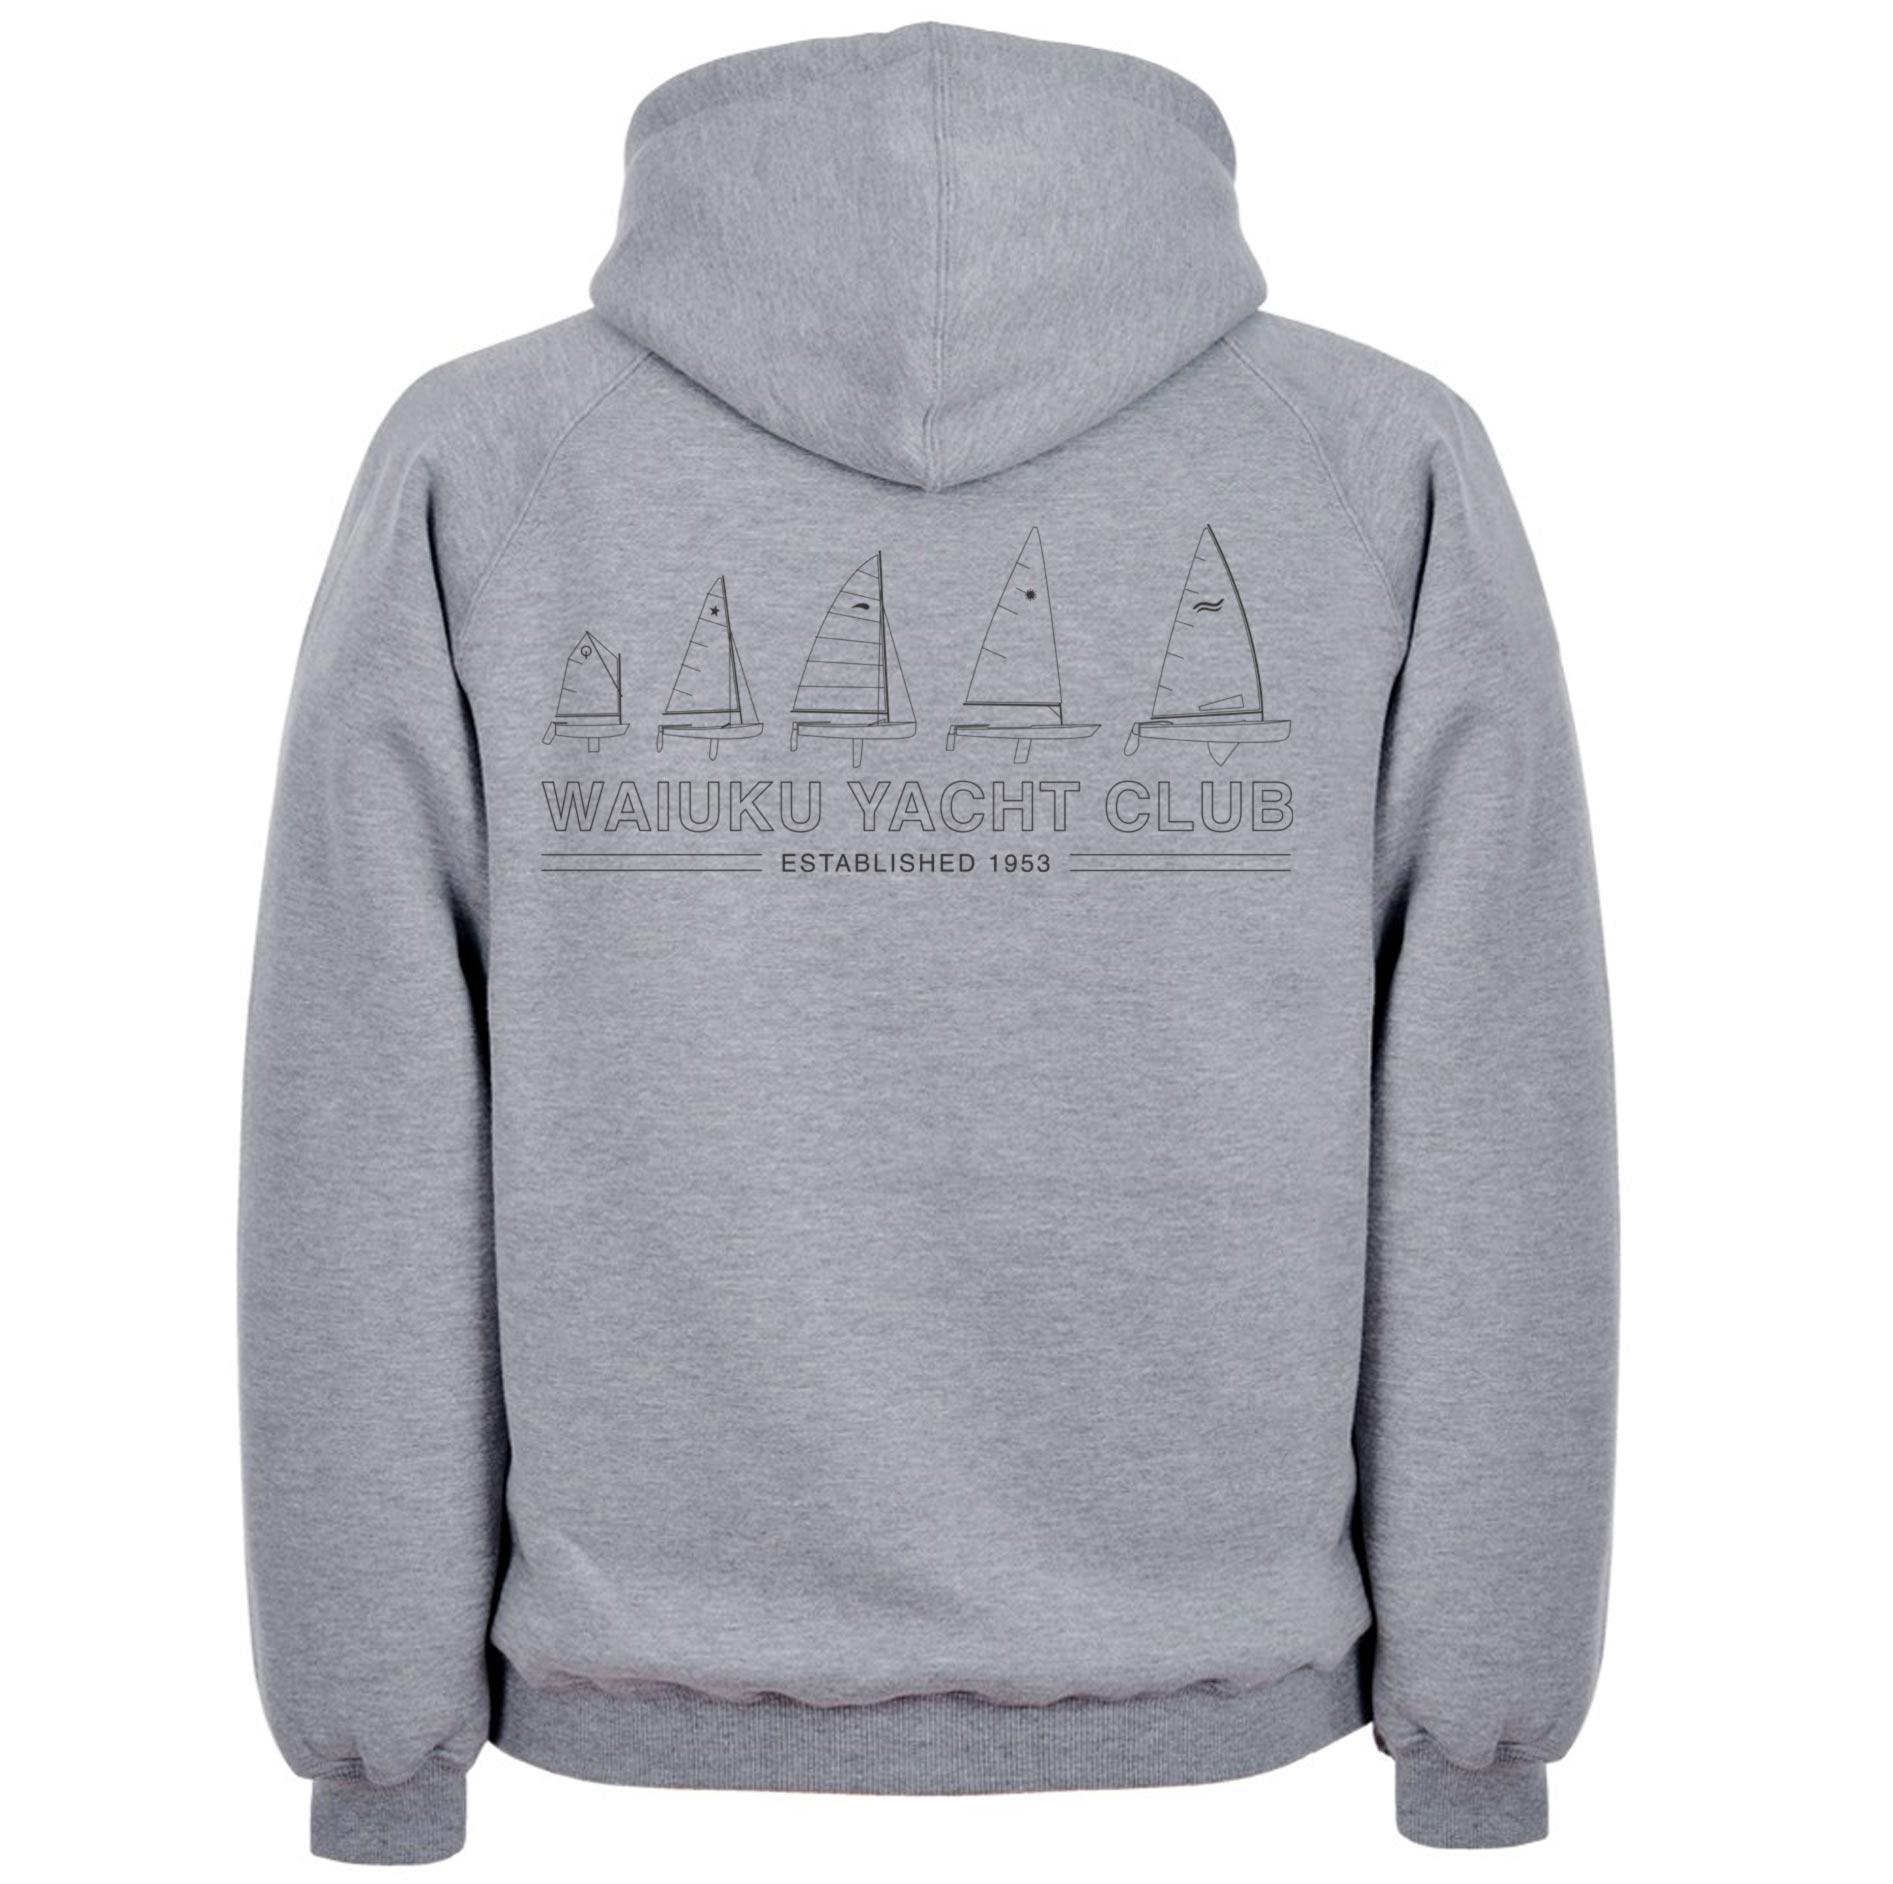 WYC Hoodie Greymarle - Back